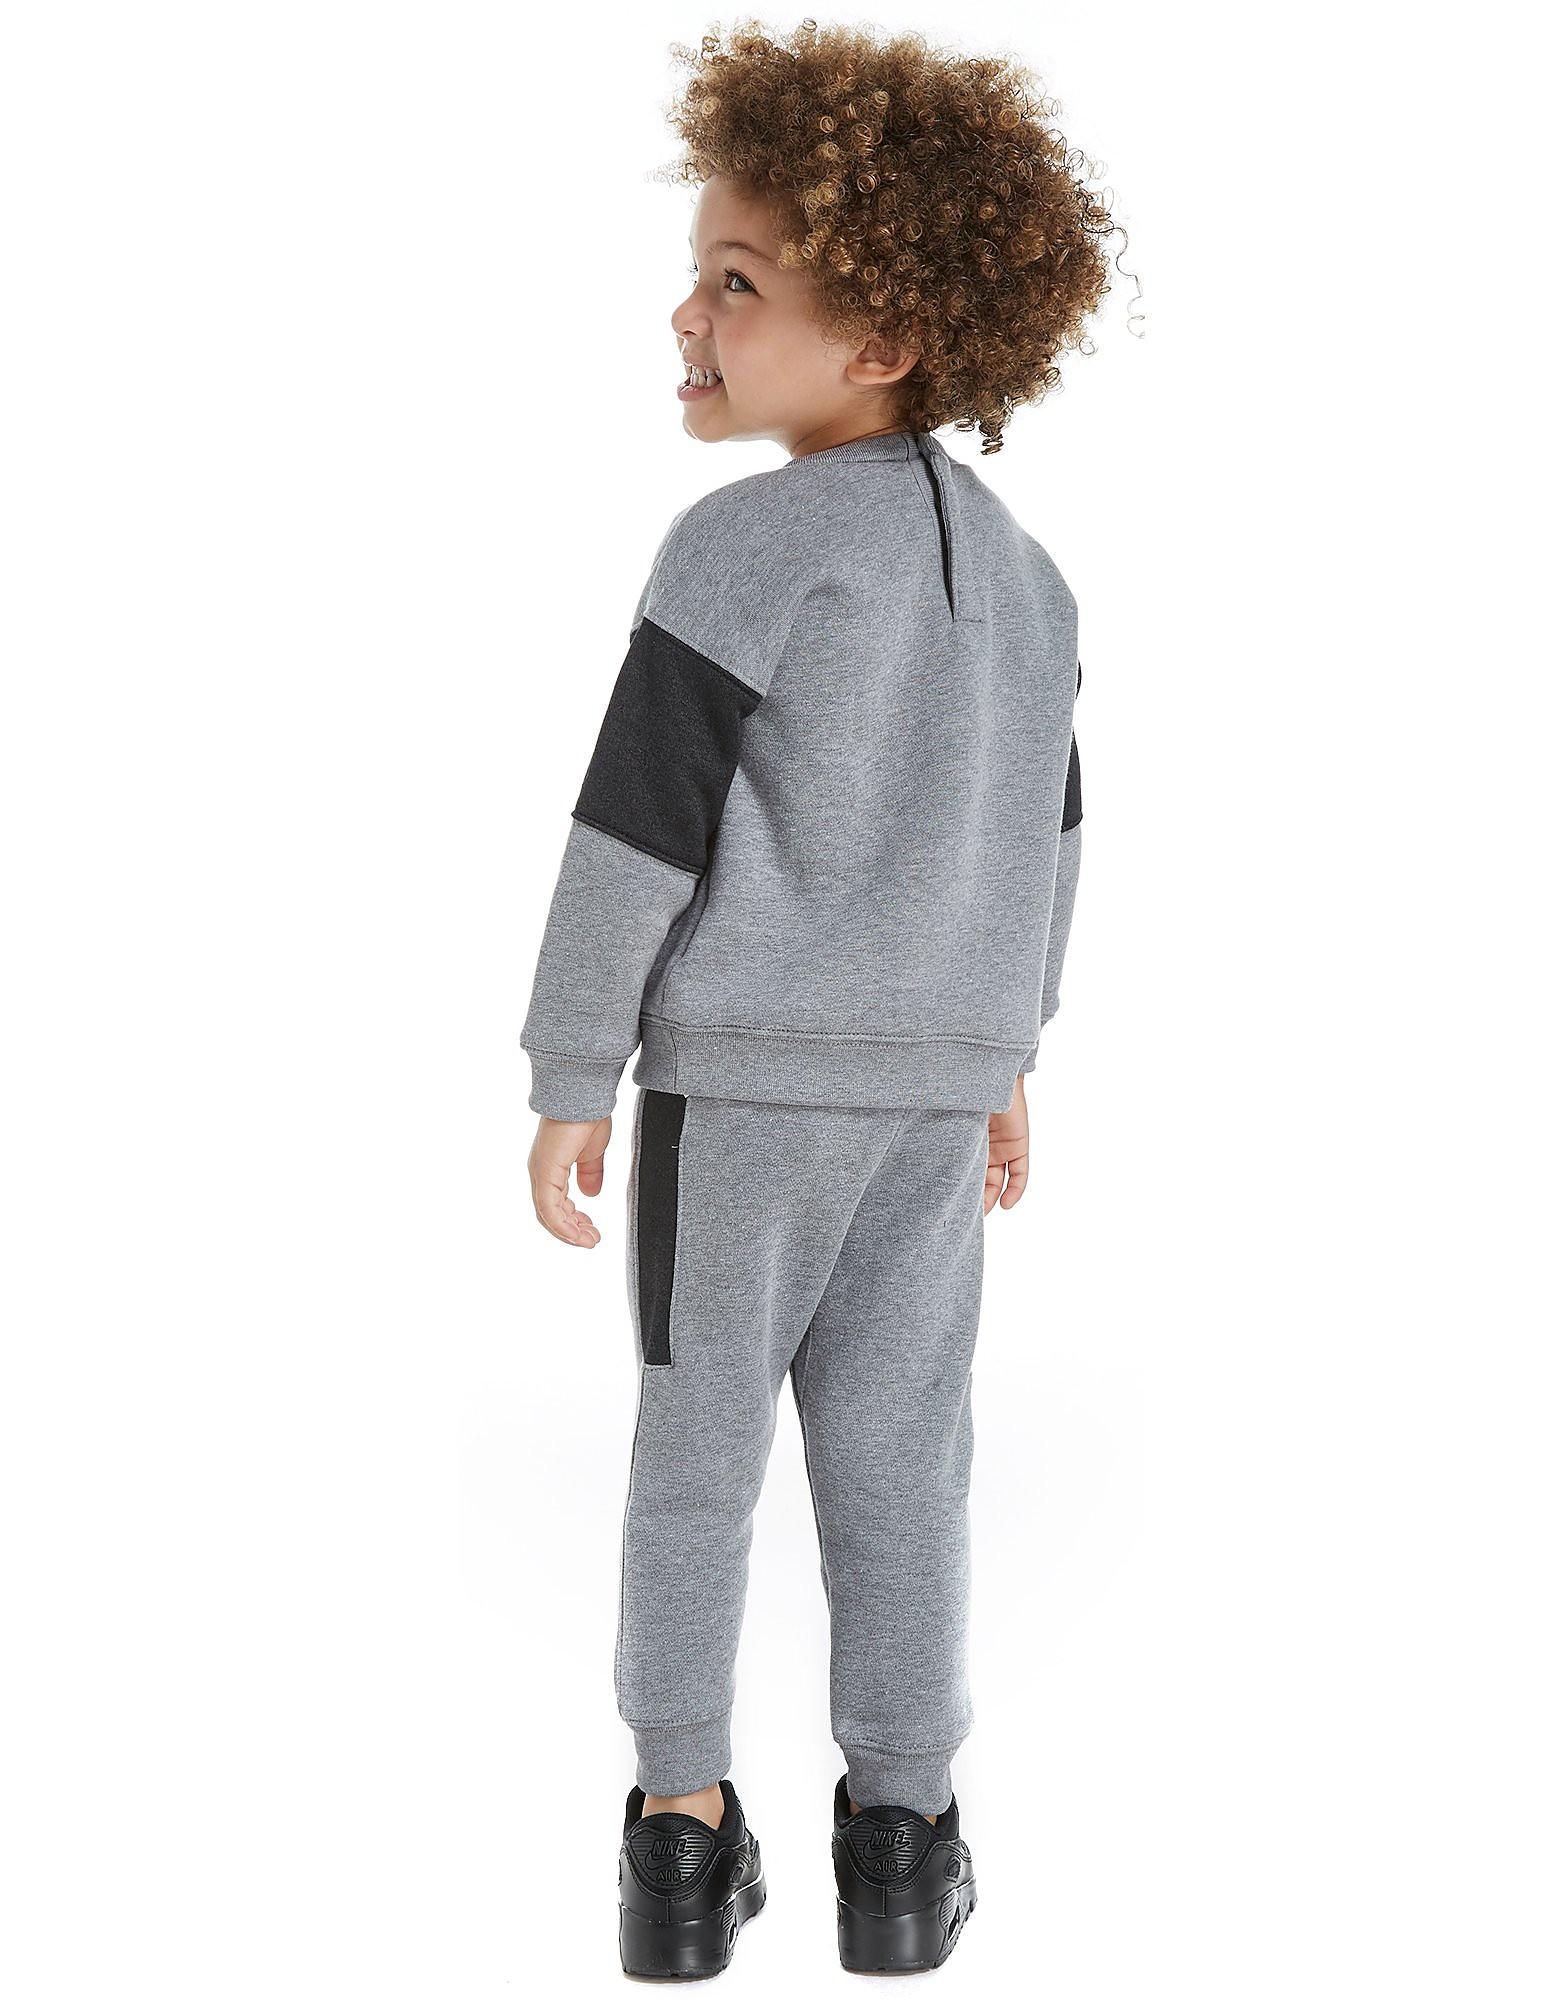 Nike SB Air Crew Suit Infant